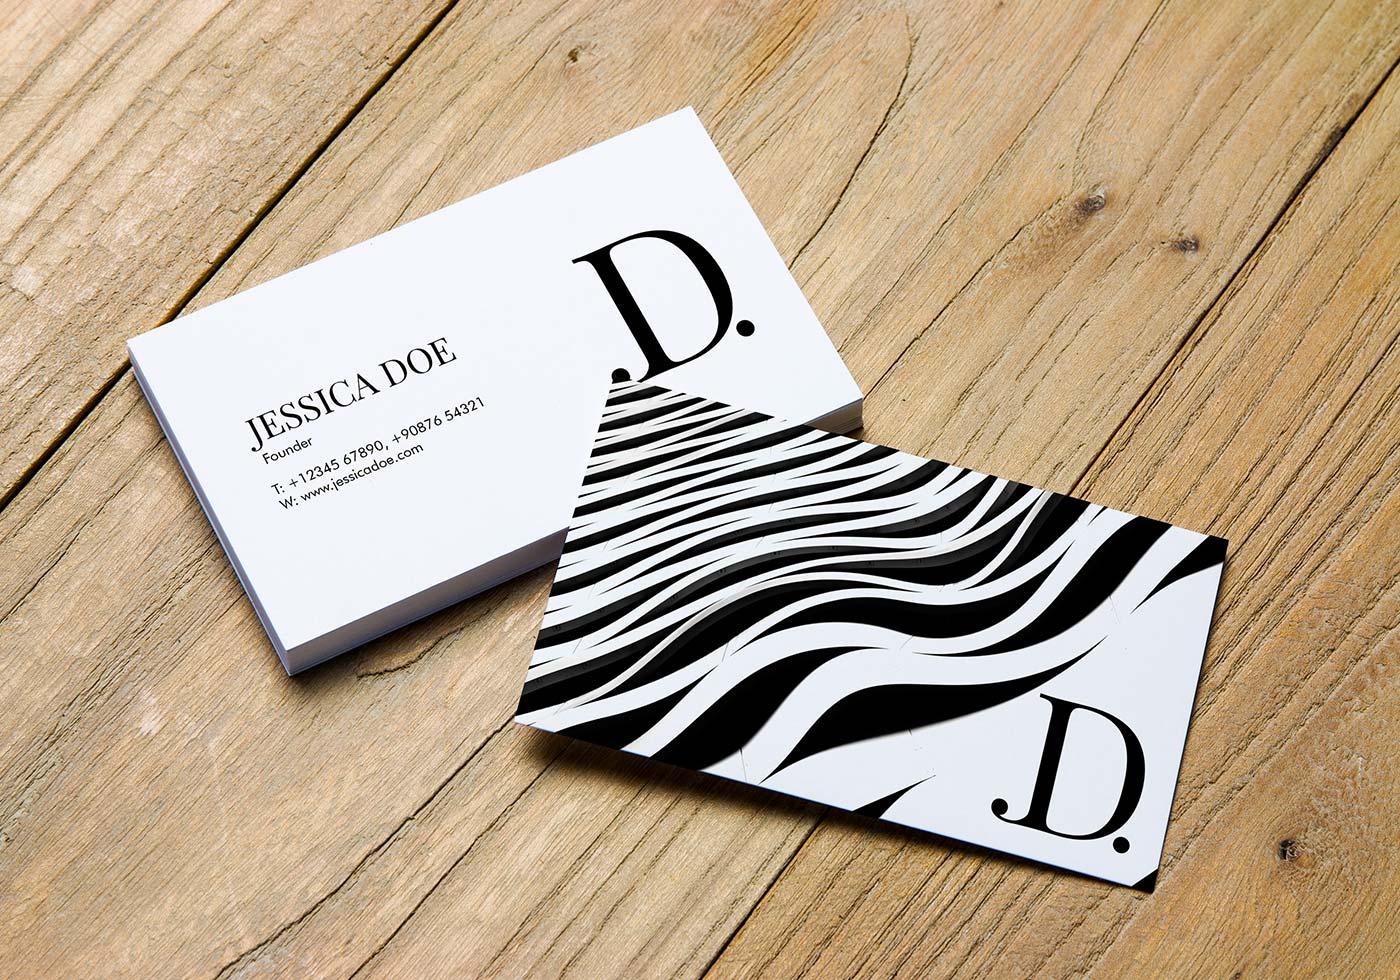 blank business card design mockup psd file free download - 1000×750